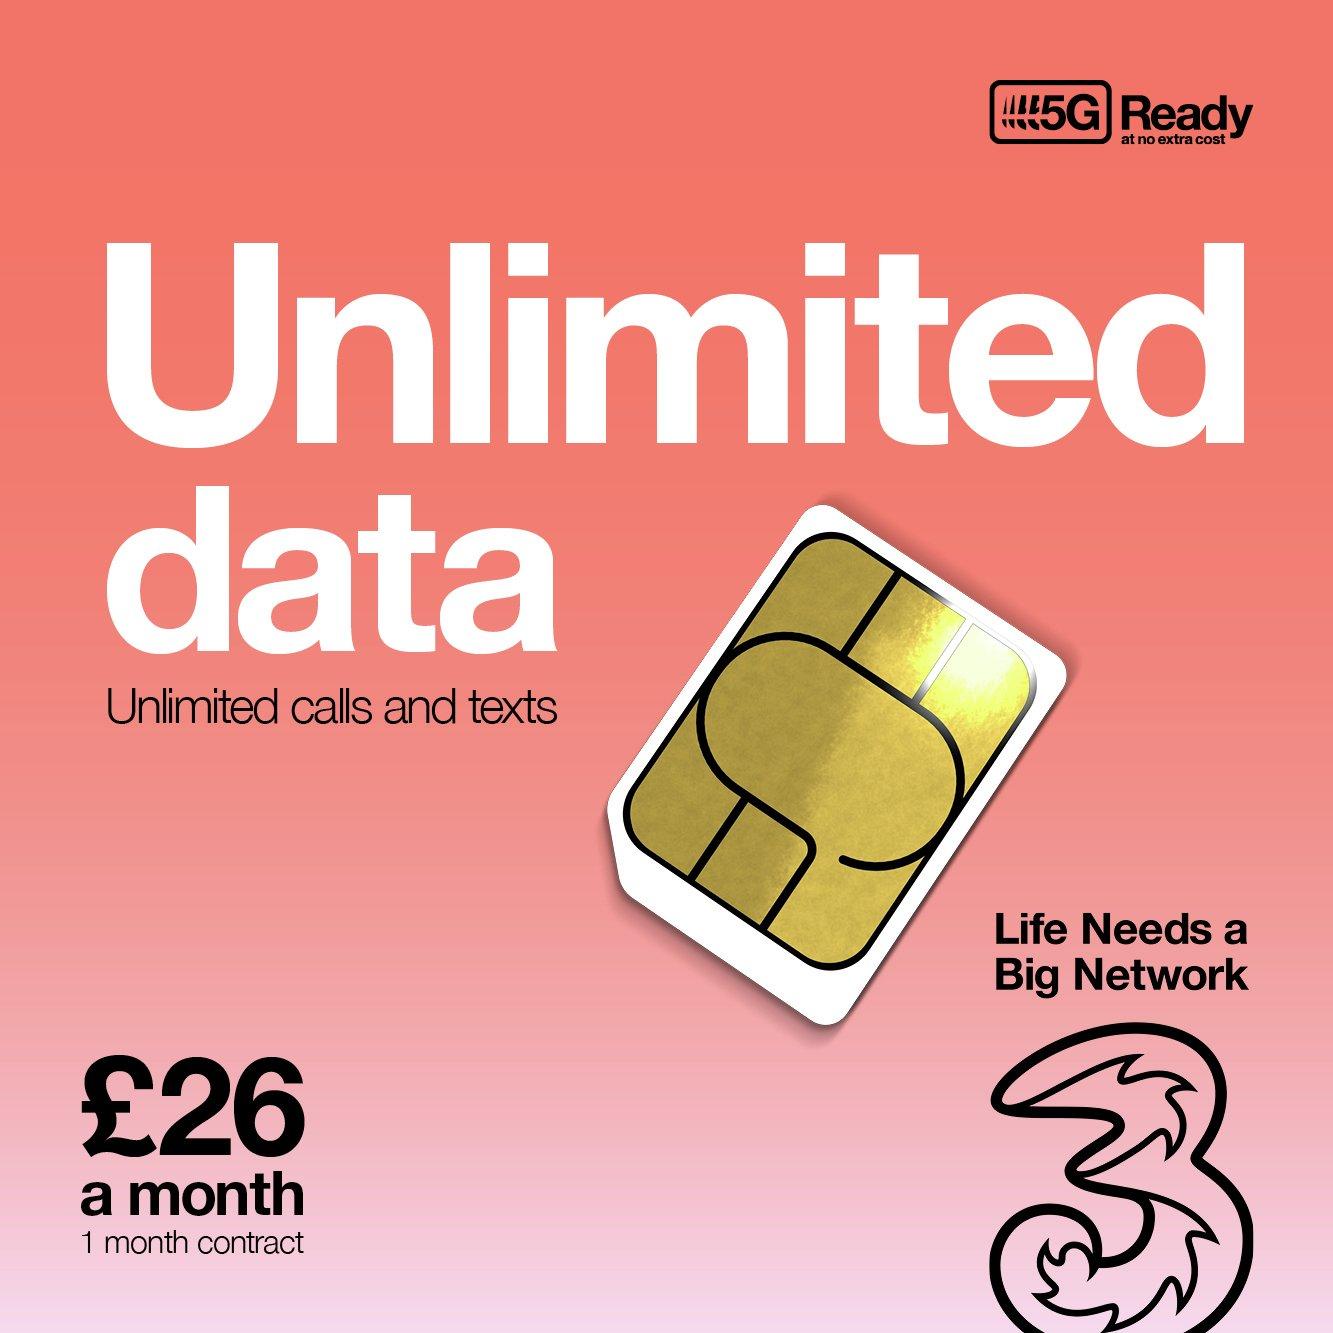 Three Unlimited Data, Minutes & Texts 1 Month SIM Card